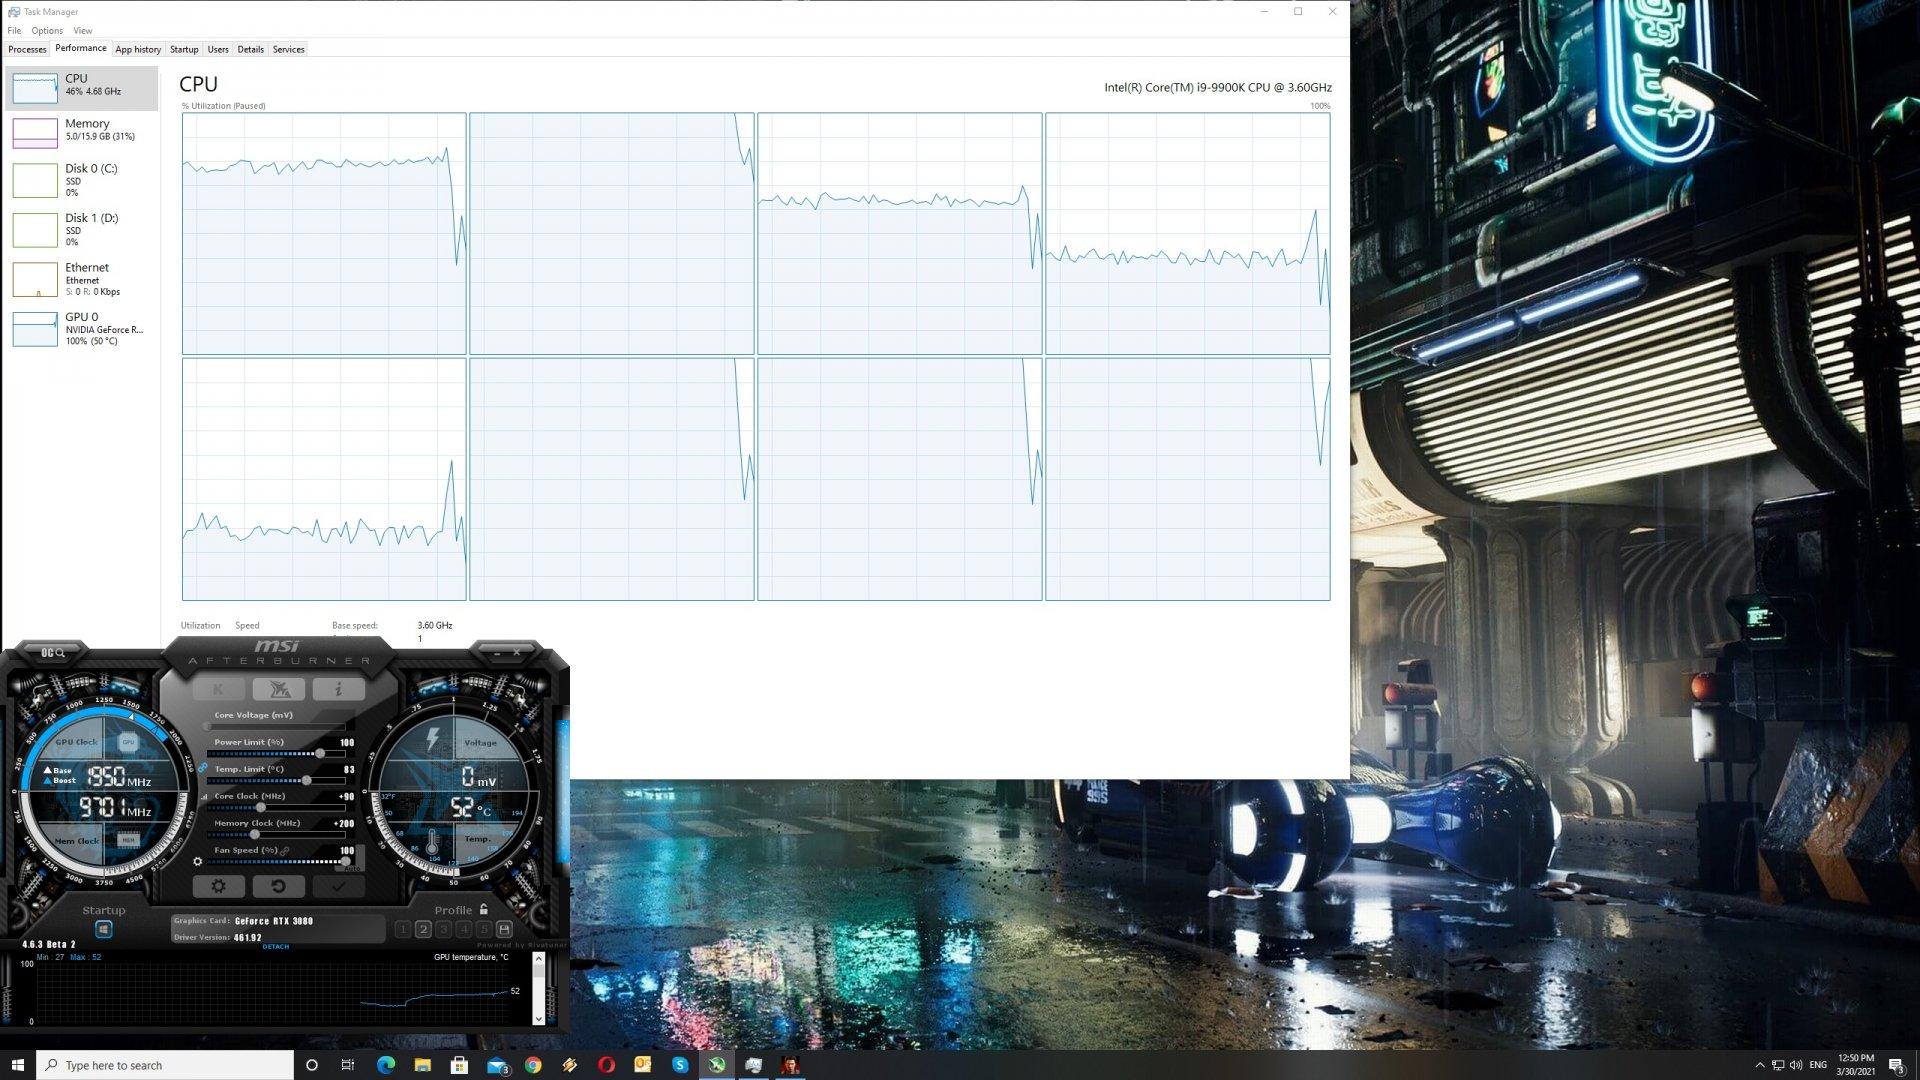 Yakuza 6 CPU usage